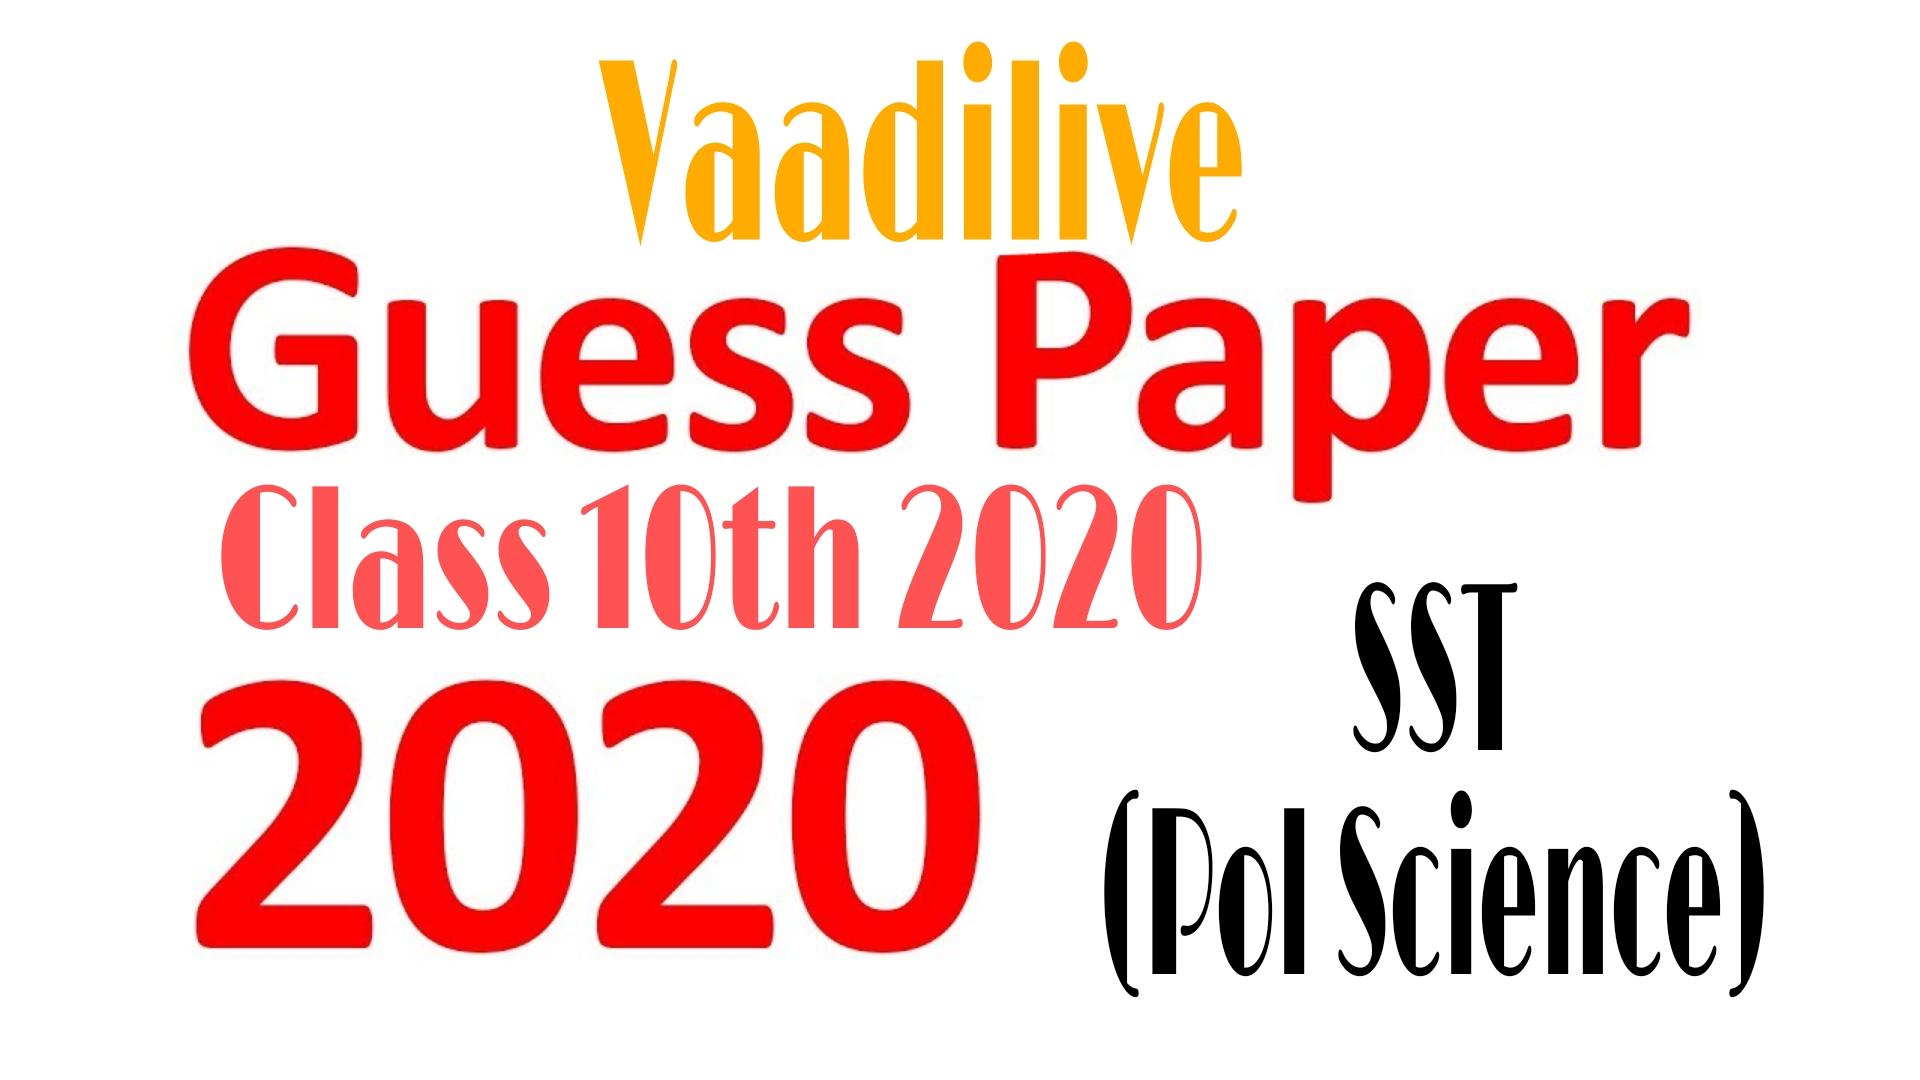 JKBOSE Class 10th SST Civics Guess Paper 2020 | Download Now